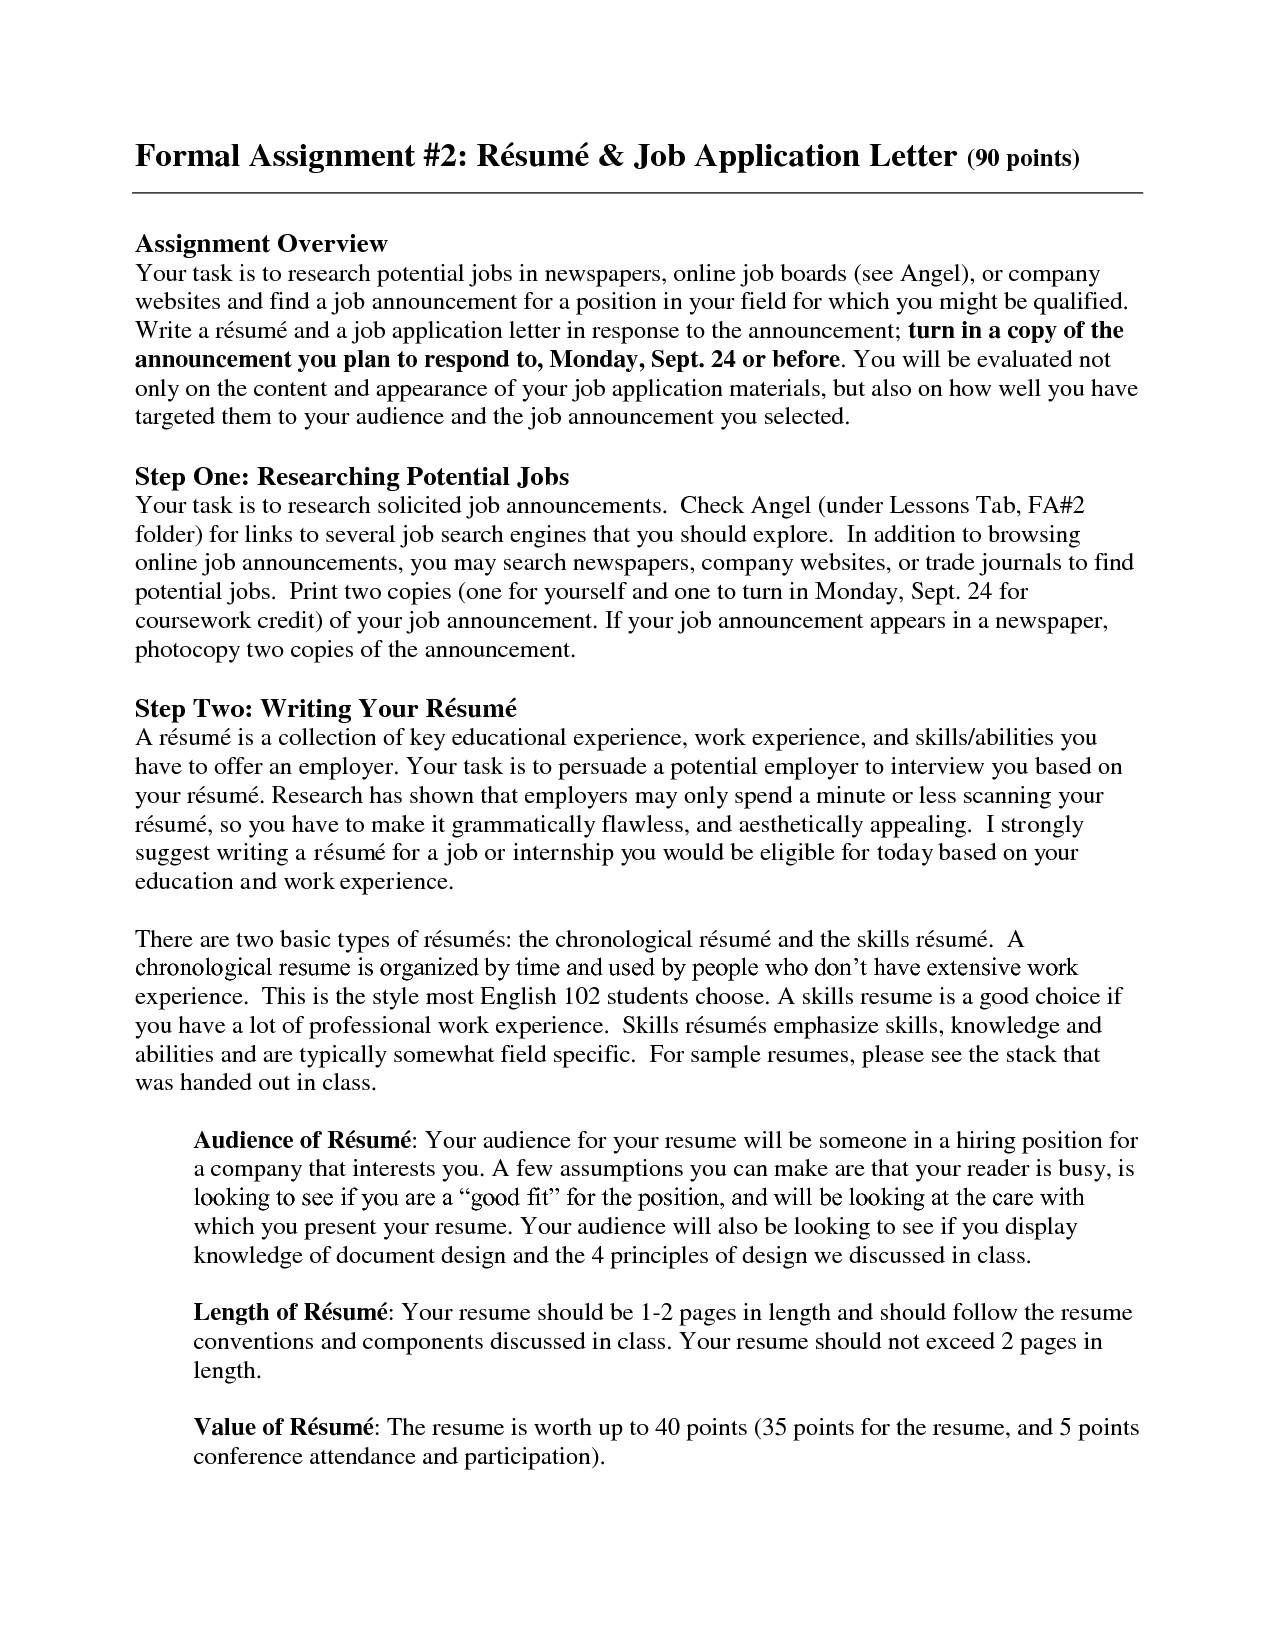 sample resume letters job application